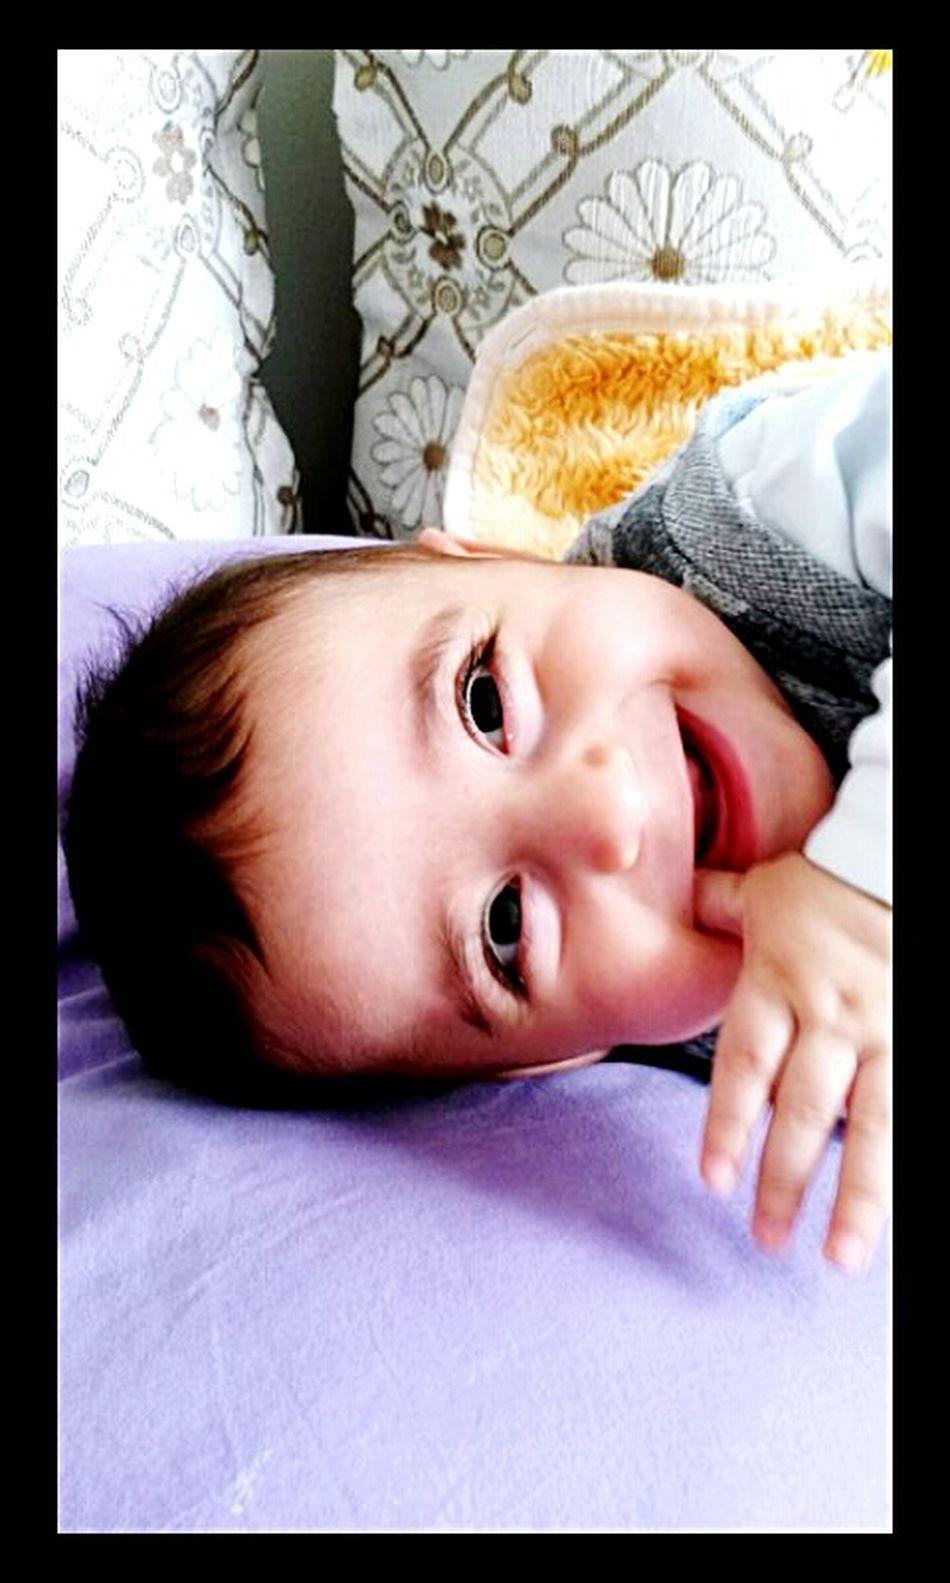 People My Sweet Brother Cheese! Selfie :) Happy People Babyboy Relaxing Happiness Selfie✌ Smile Smilee Smile ✌ Smile :) Enjoying Life Cool Cool Smile Taking Photos Baby Sweet Baby Sweet Baby Boy